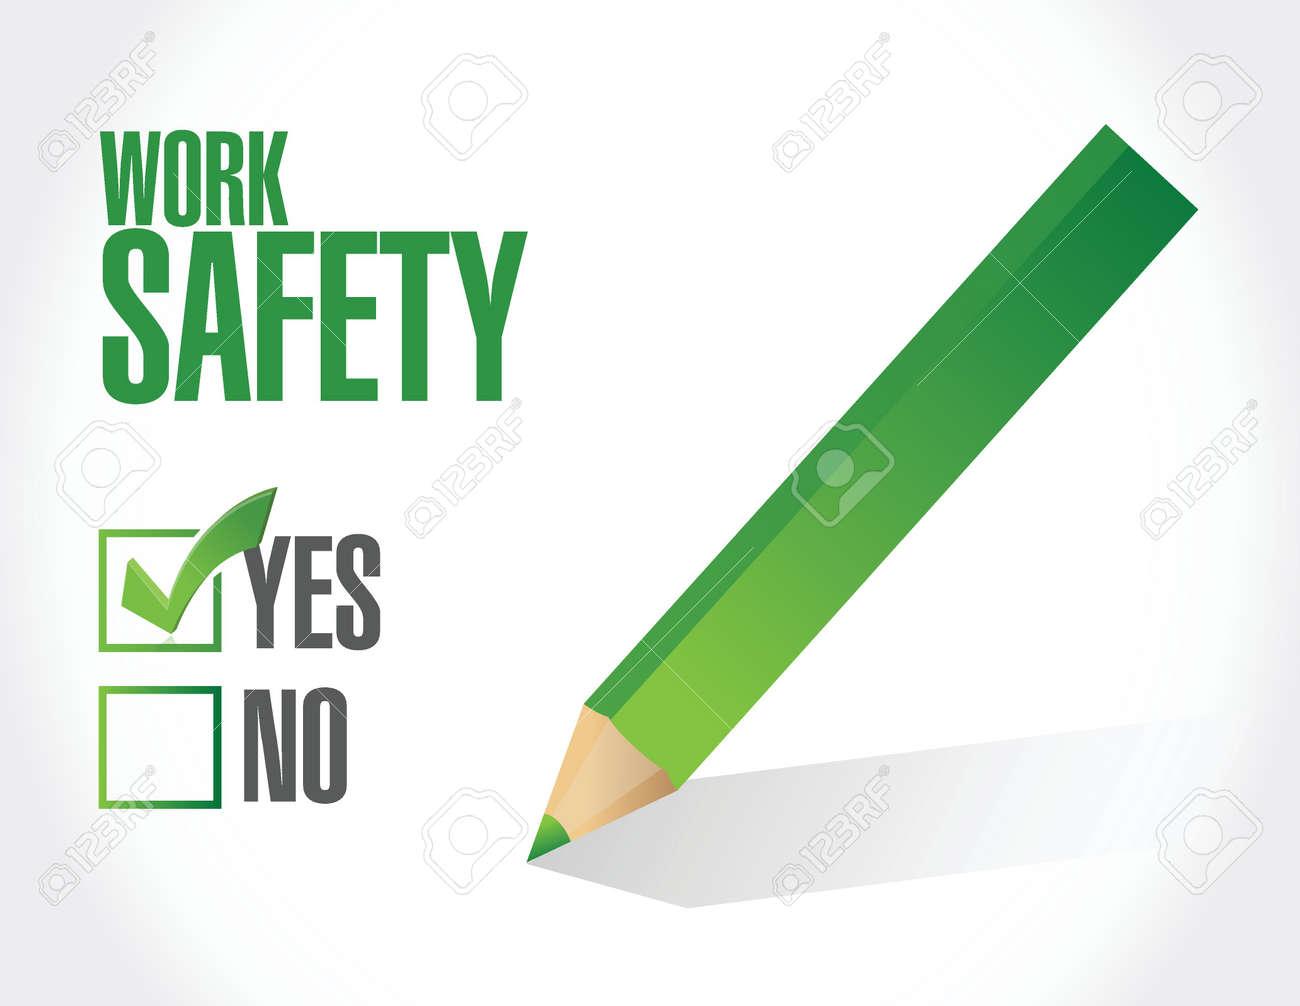 work safety check mark sign concept illustration design over white - 38010461